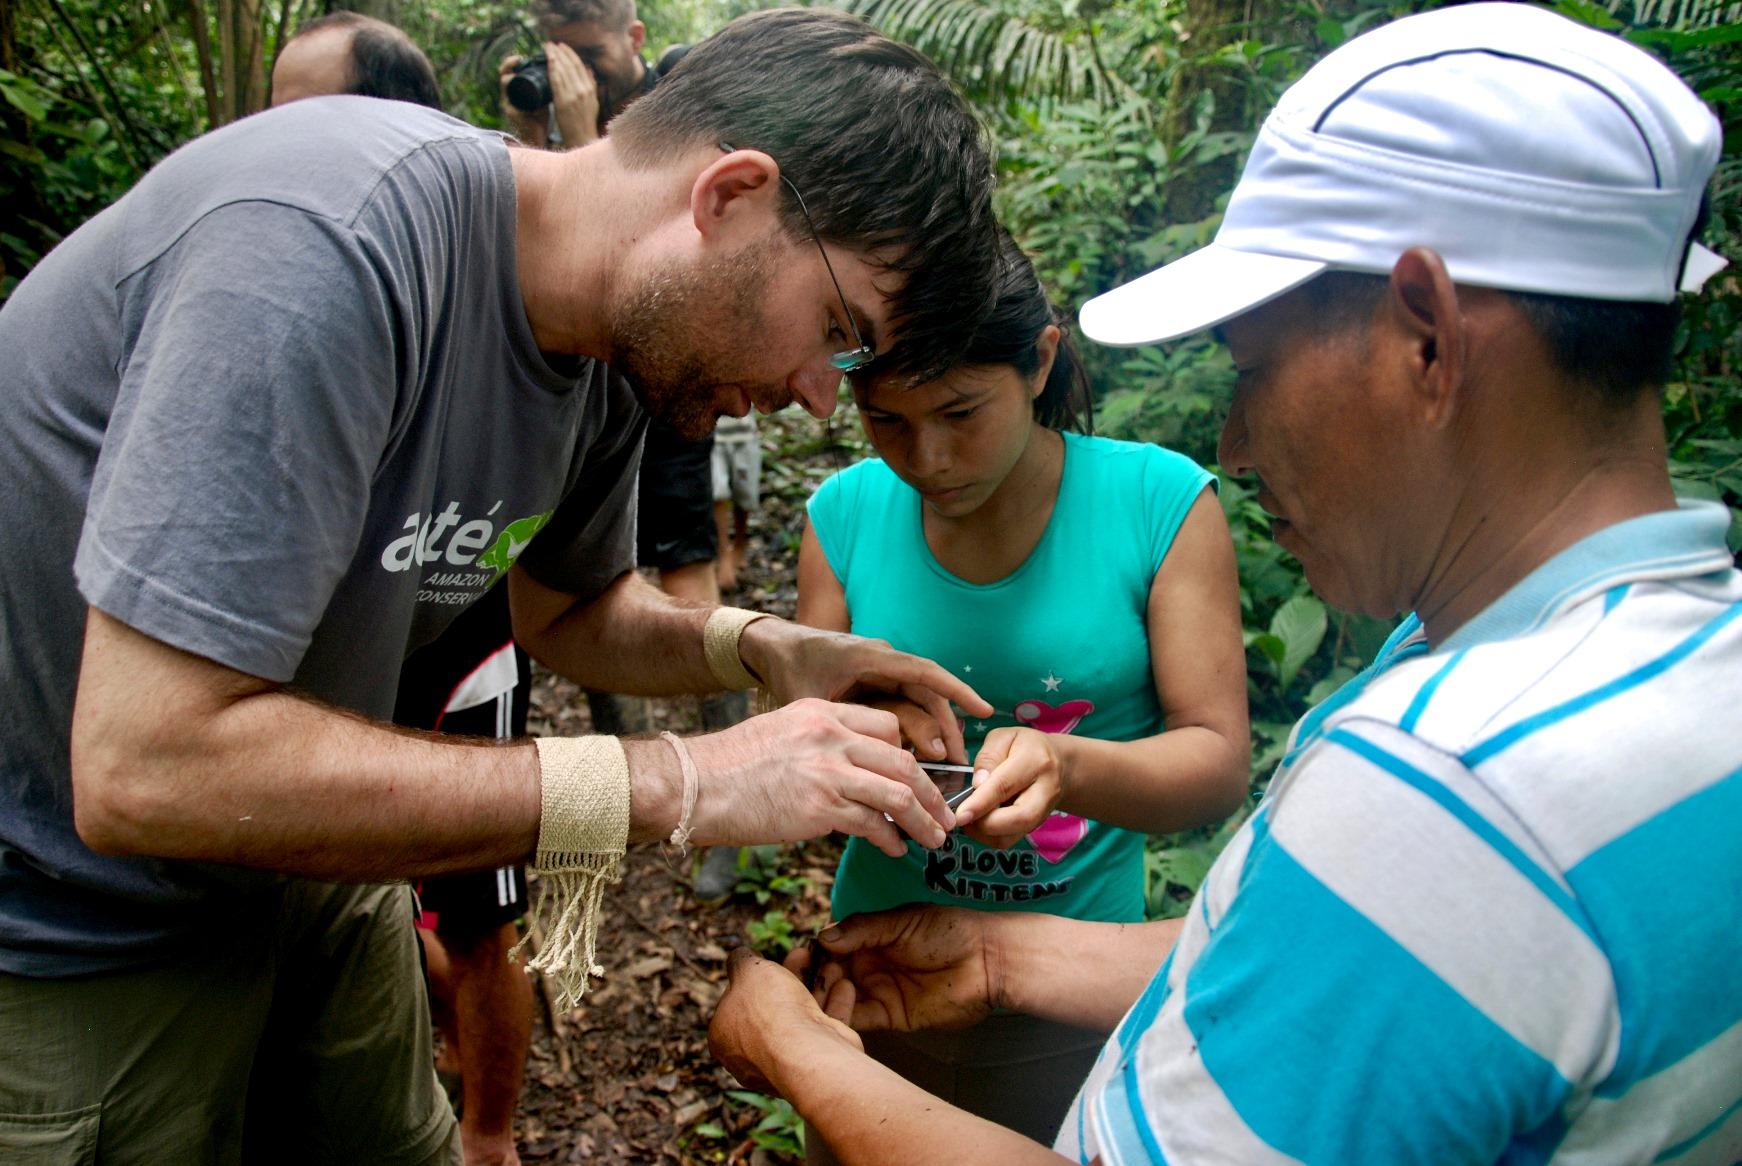 Acaté's president Christopher Herndon and Matsés residents Casilda Jiménez and Segundo Shabac Reyna Pérez developing the pilot herpetological inventory near Estirón village.